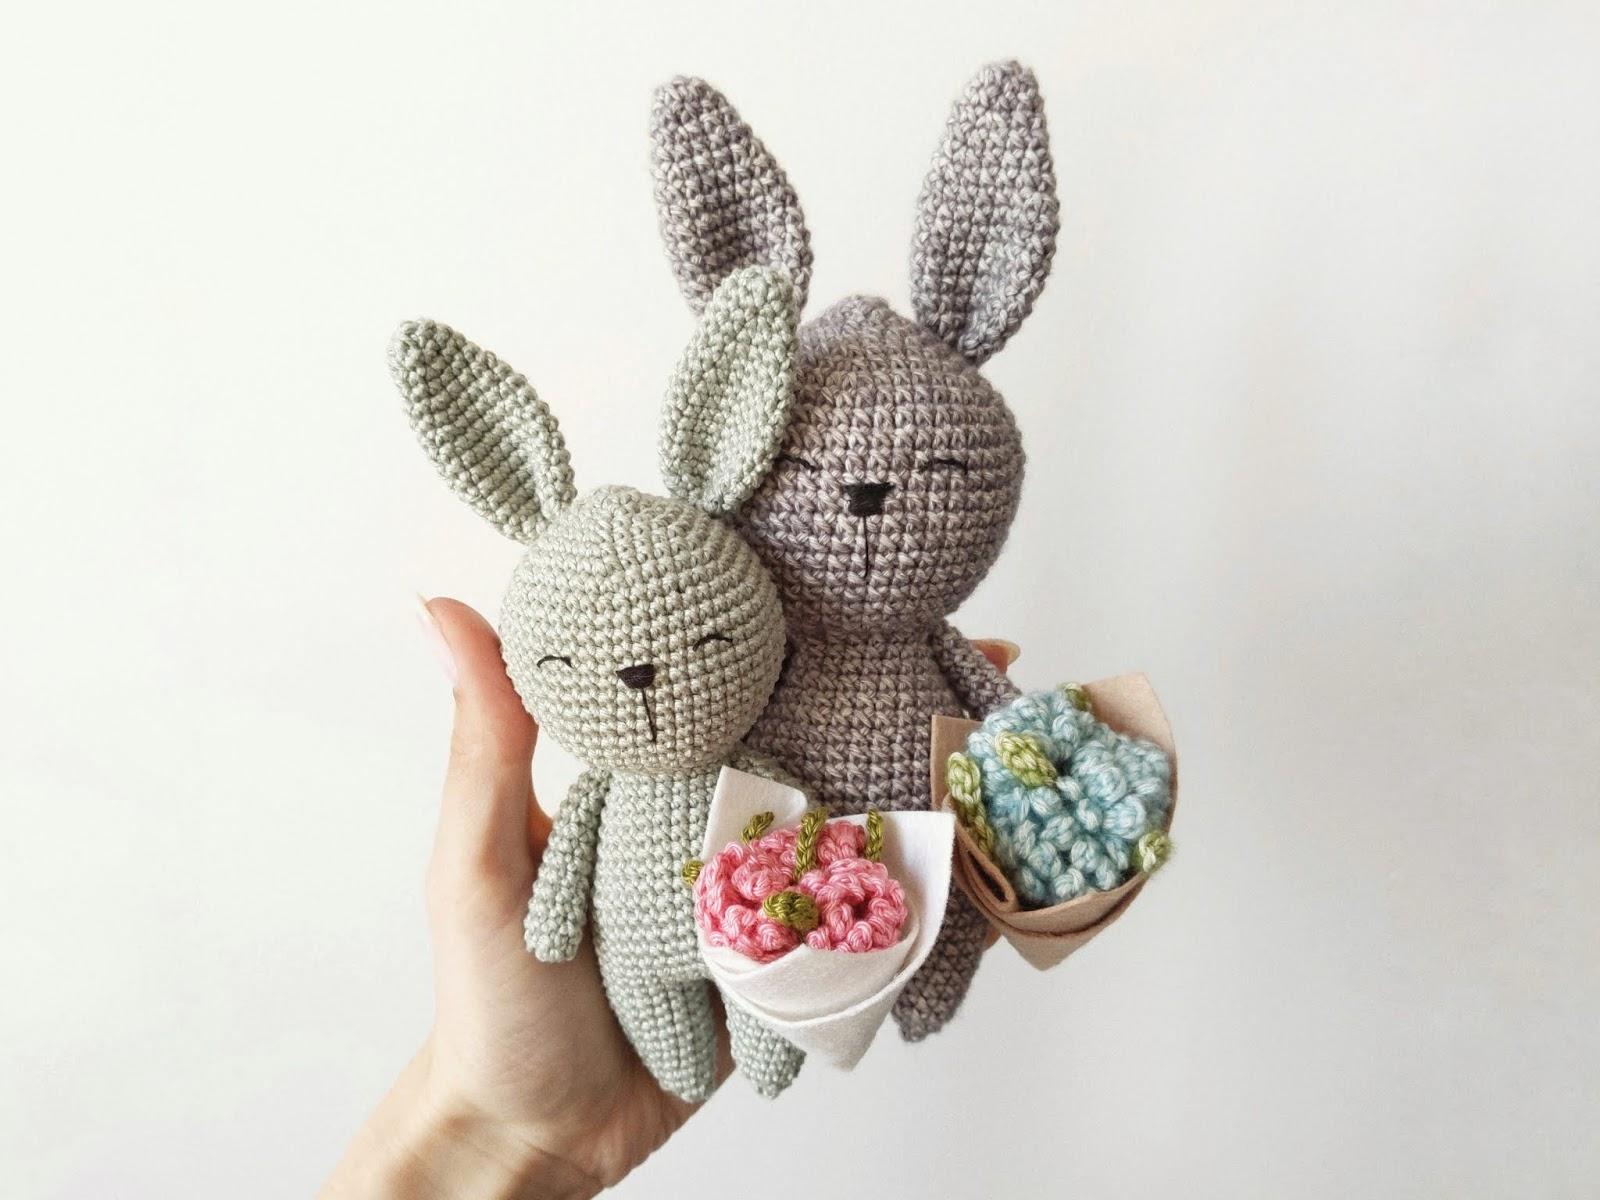 Amigurumi Sweetheart Plush Bunny Crochet Free Patterns - Crochet ... | 1200x1600